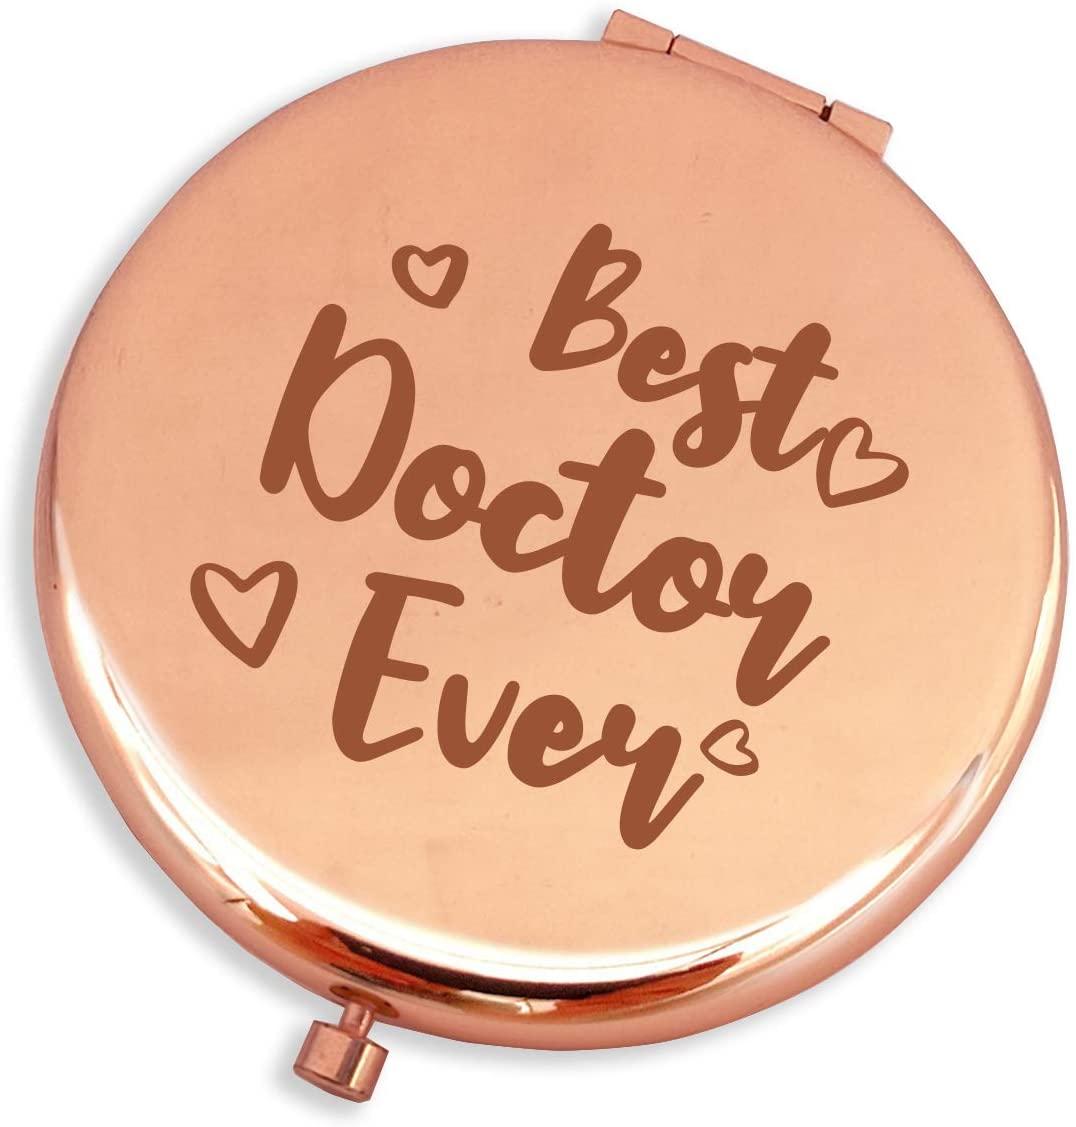 Blue Leaves Best Doctor Ever-Funny Doctor Gifts for Women,Doctor Gifts Funny,Doctor Birthday Gifts Ideas-Purse Pocket Makeup Mirror Rose Gold